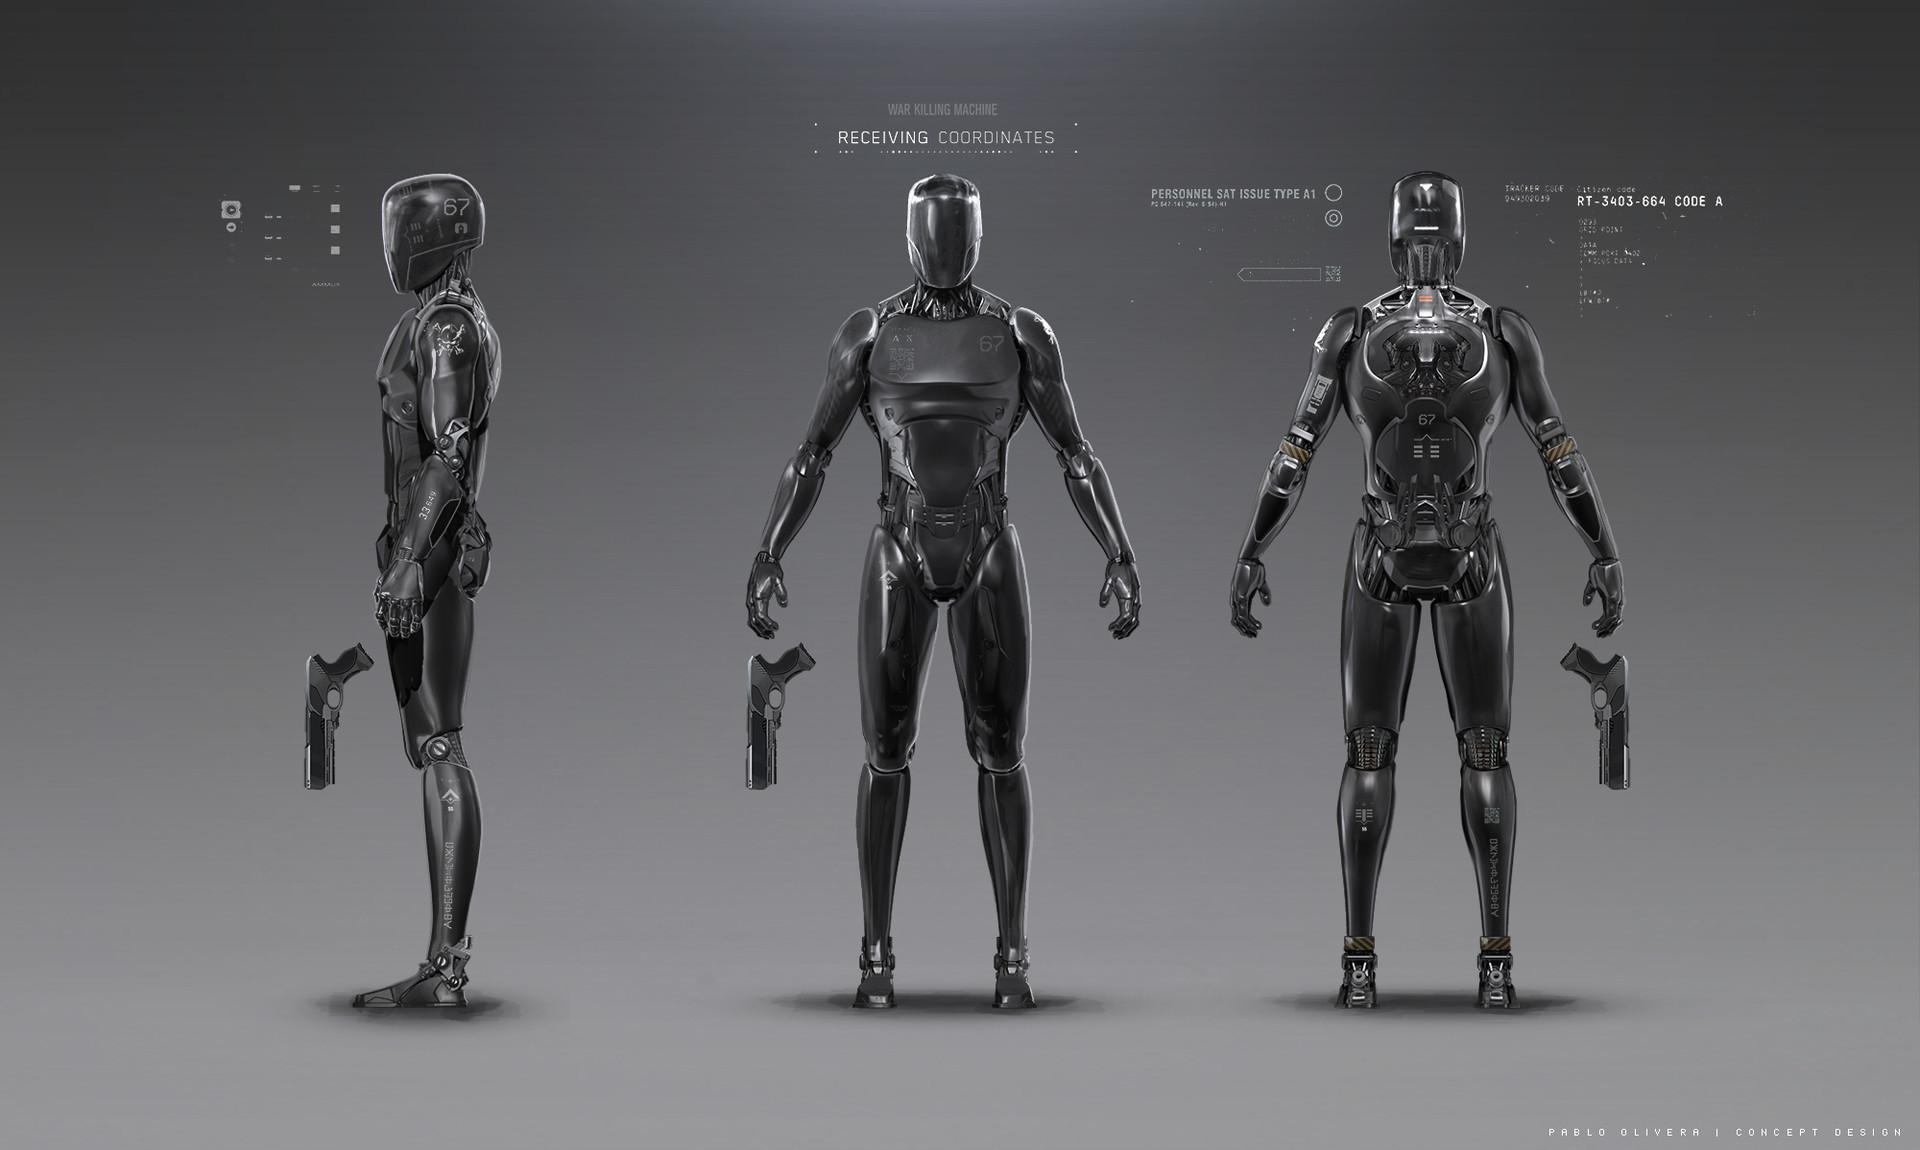 Pablo olivera pablo olivera pablo olivera concep art uncally robot v30 v4 presentacion3